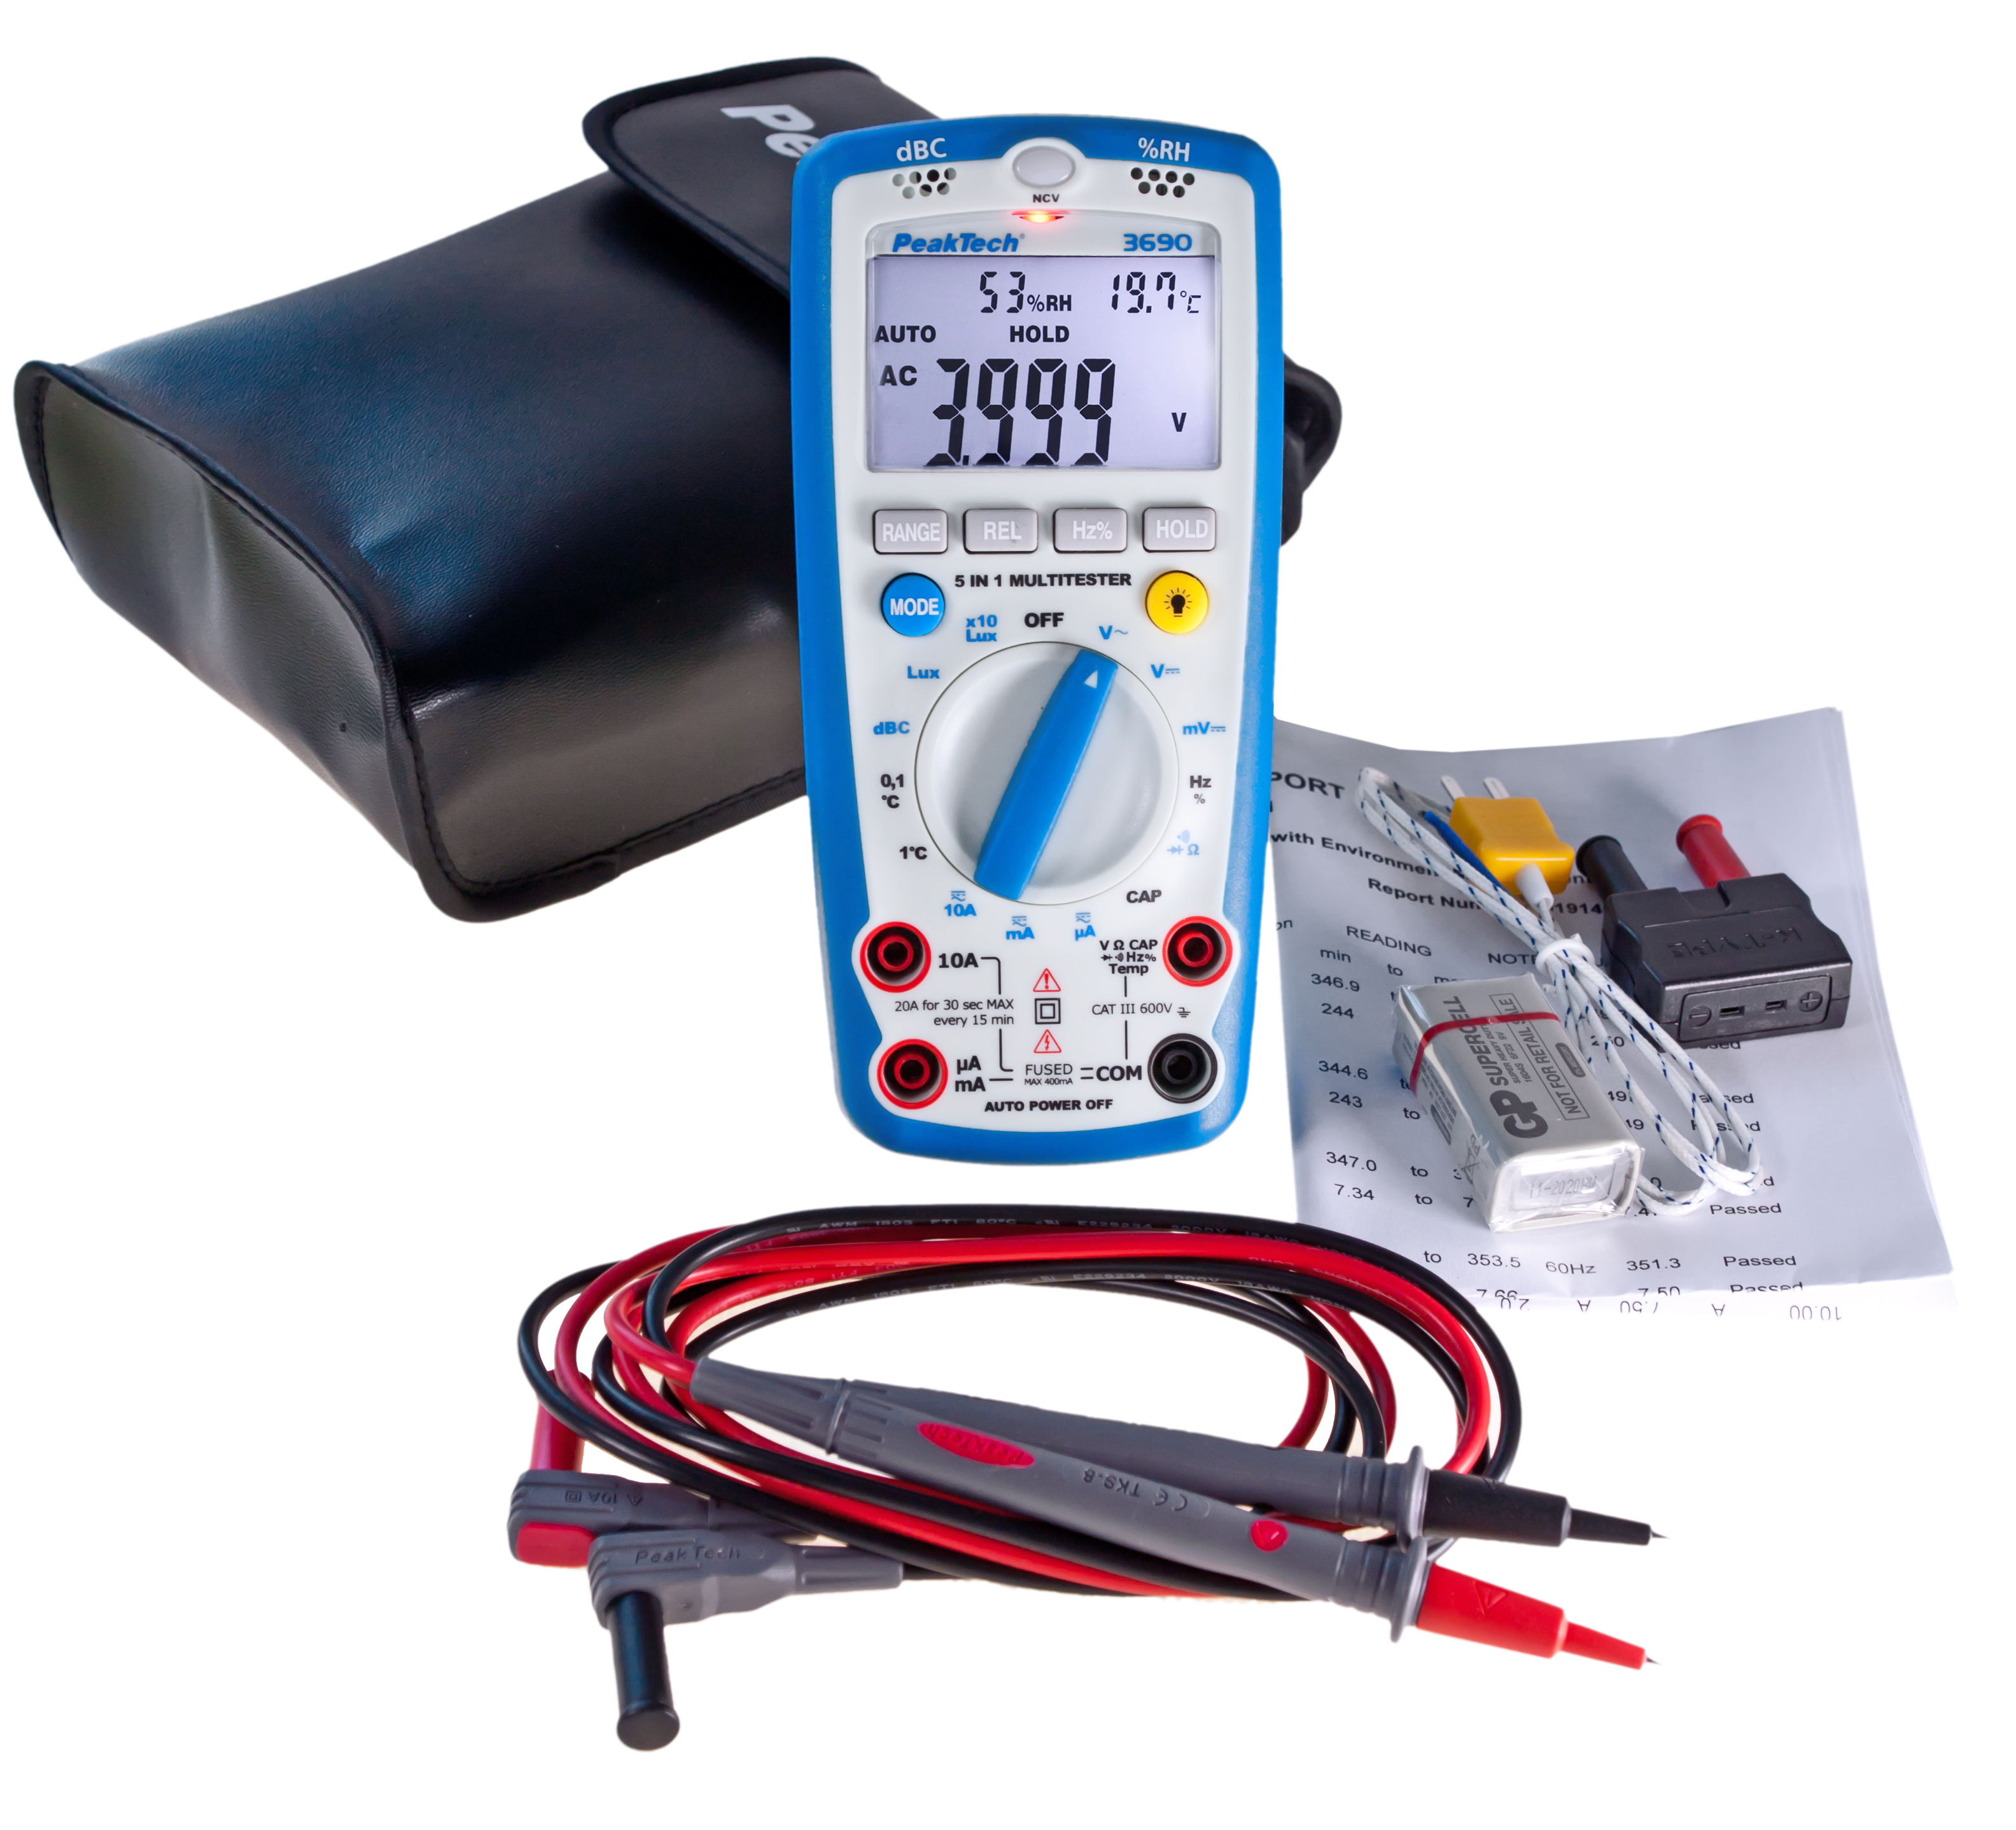 «PeakTech® P 3690» 4000 counts multimeter, environmental measurements